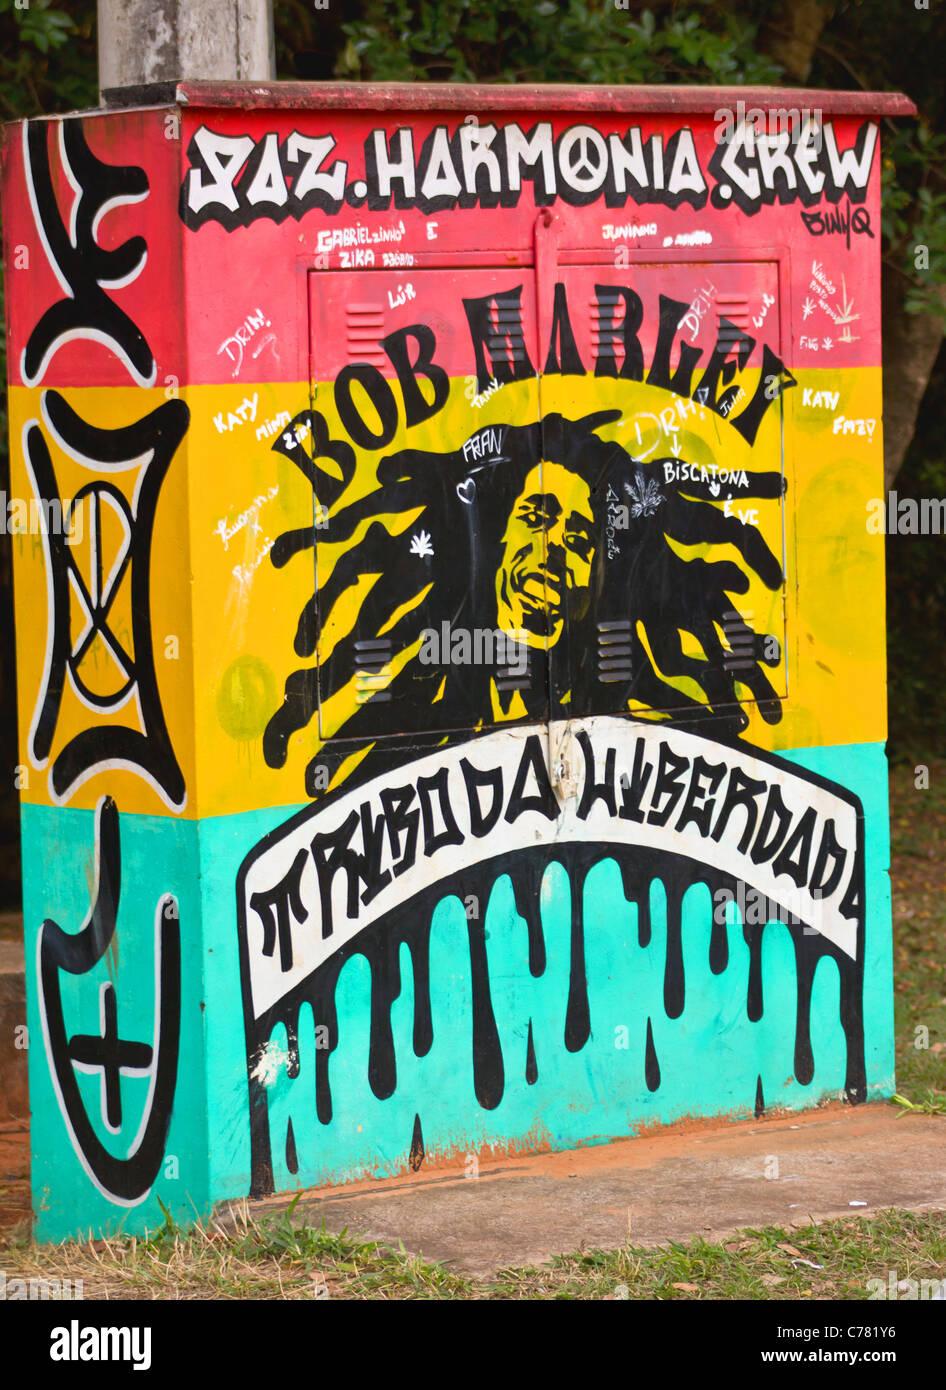 Graffiti on a wall. Urban art or vandalism. - Stock Image